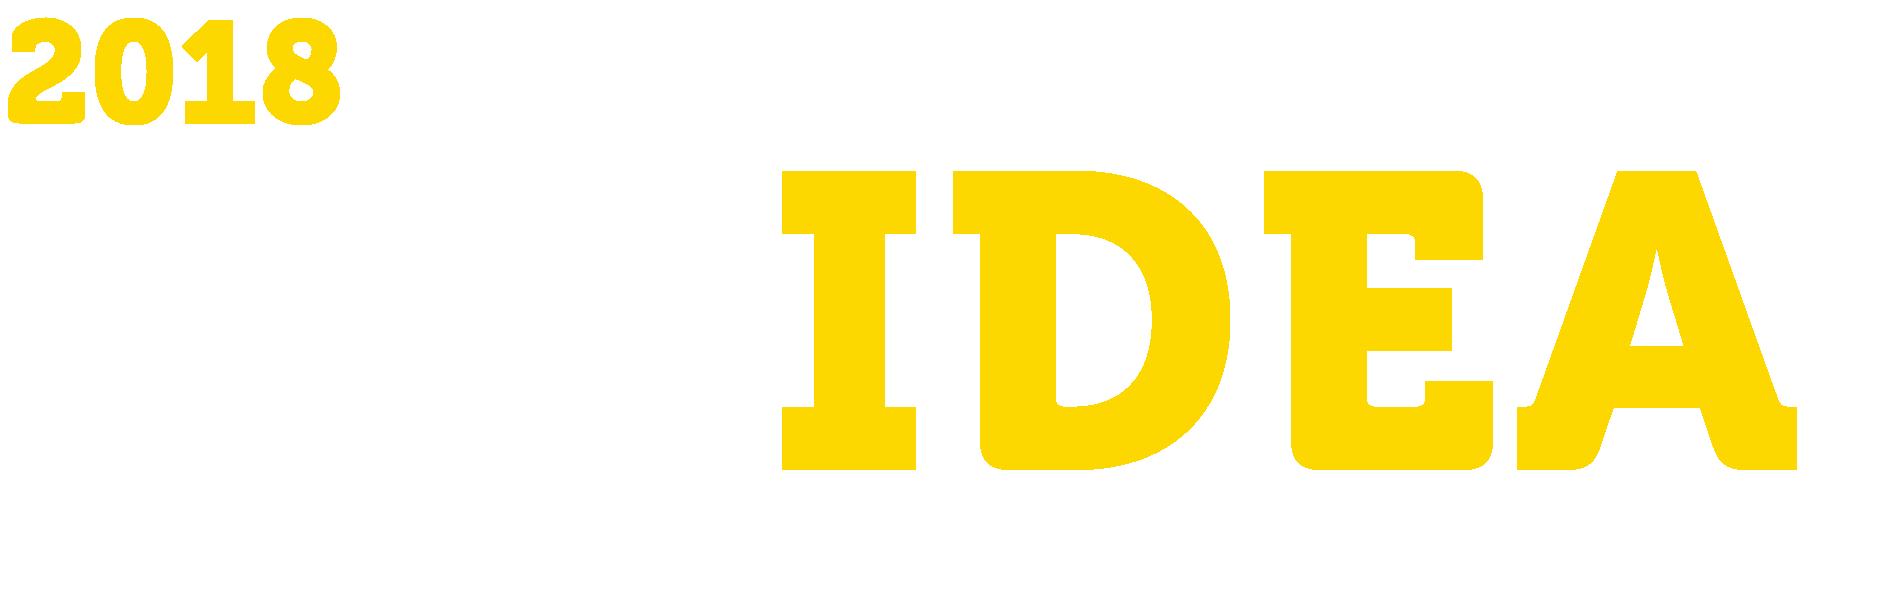 2018-Big Idea logo 1920px wide